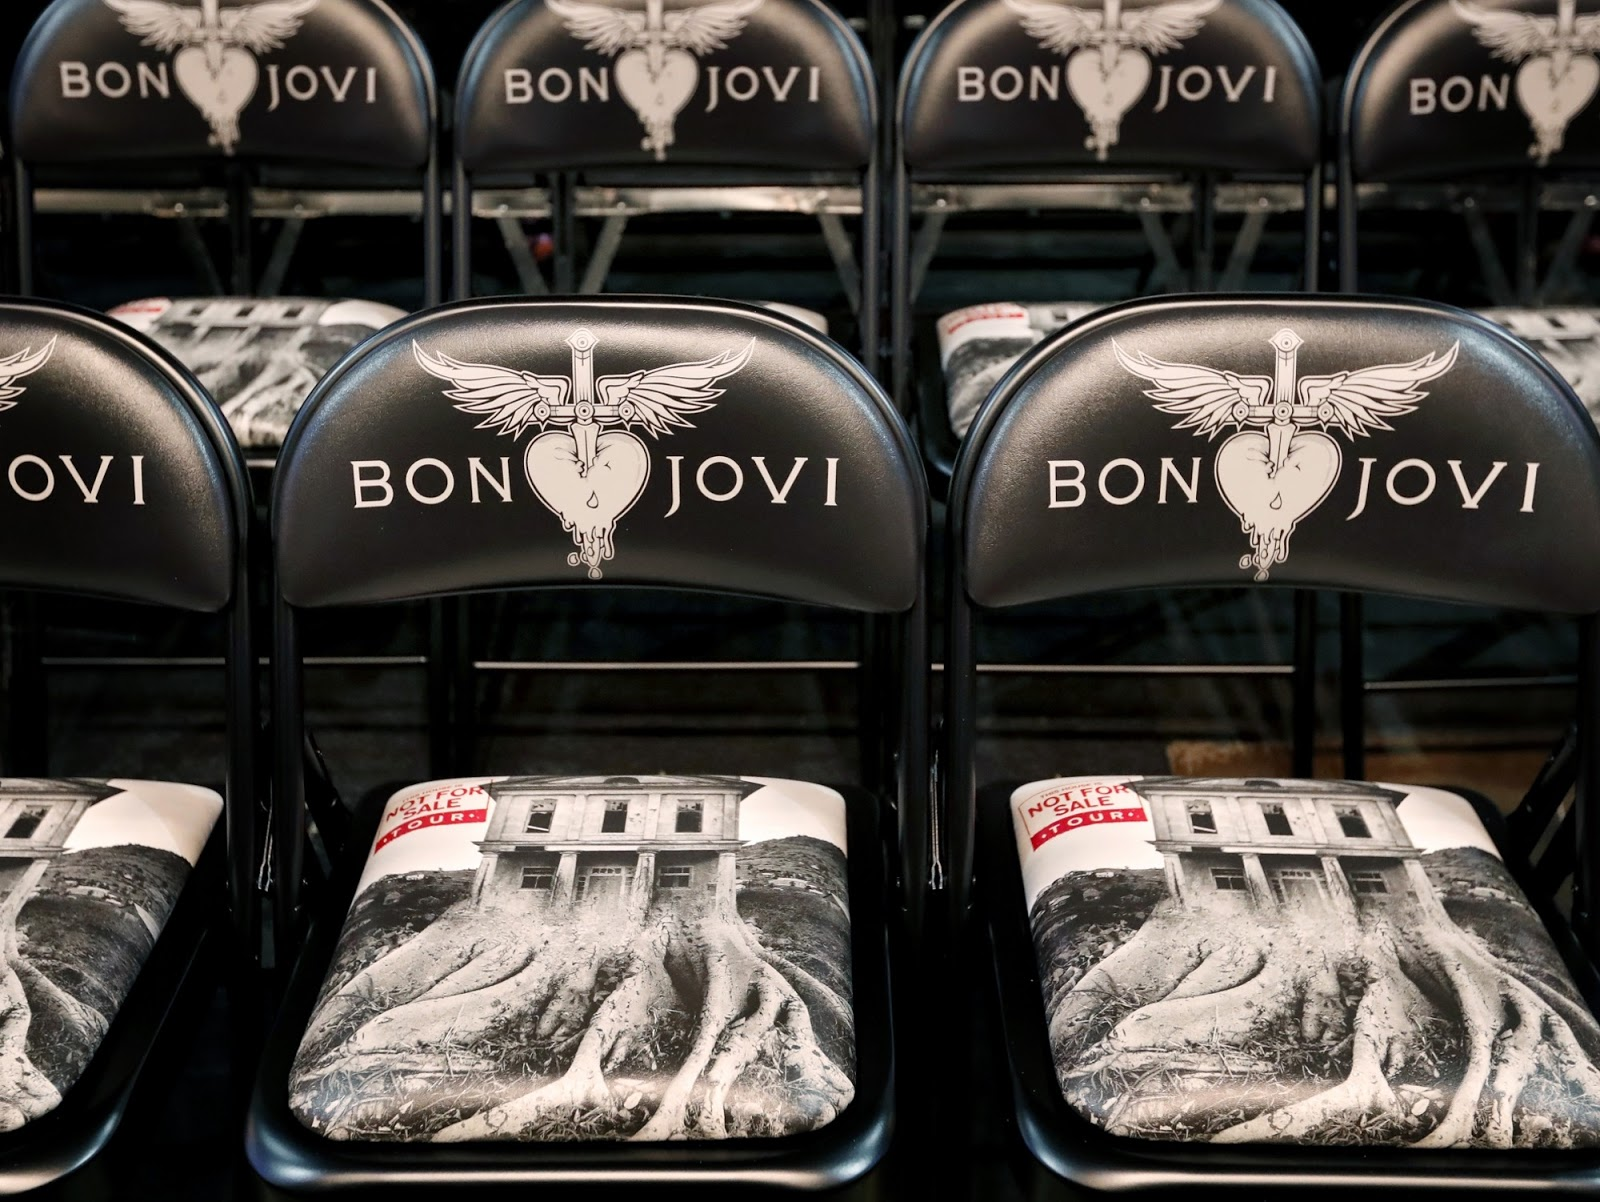 Bon Jovi Soul Food Kitchen Volunteer